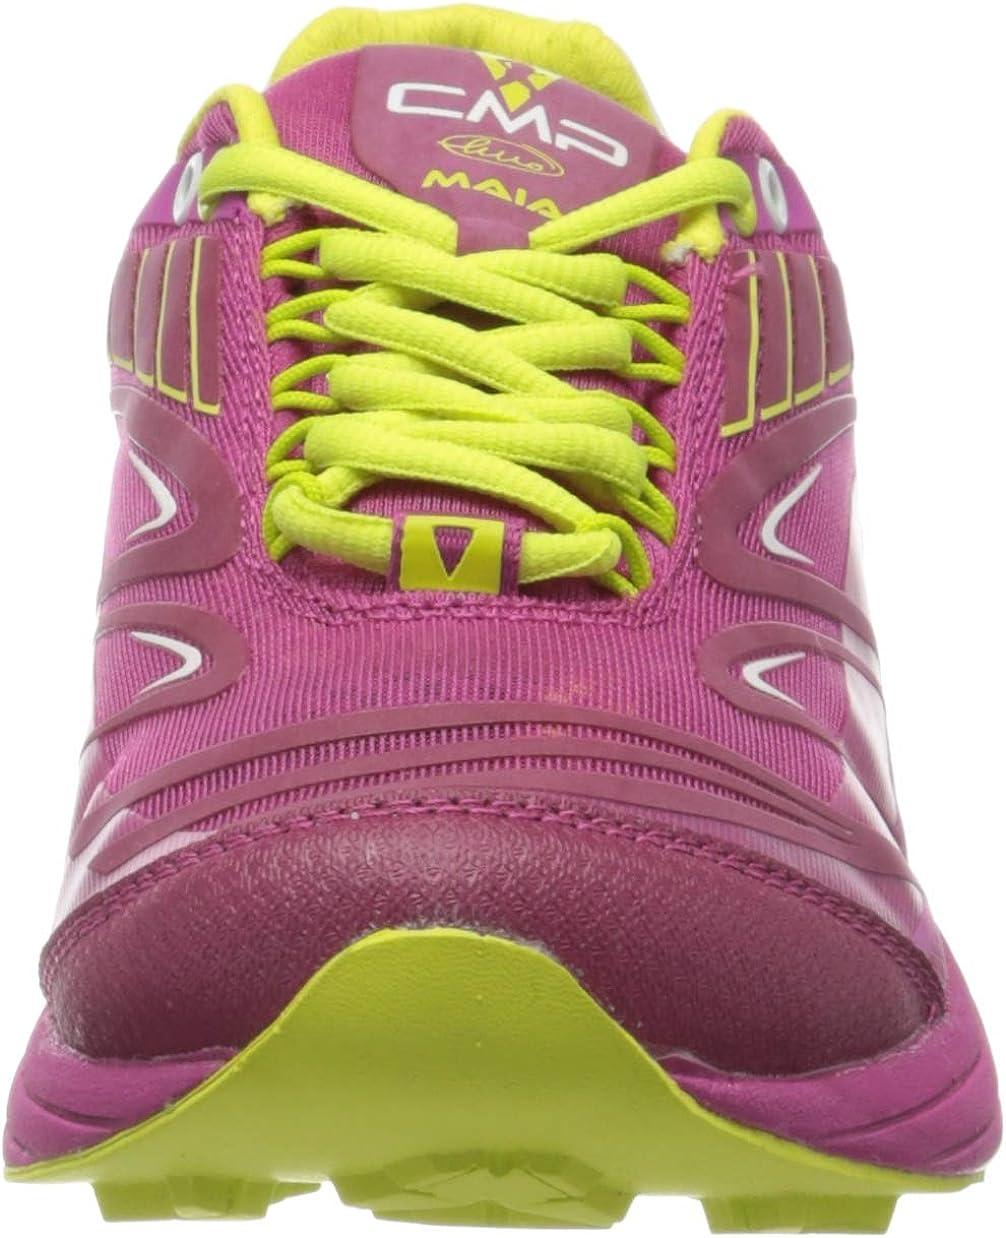 Scarpe da Trail Running Donna CMP F.lli Campagnolo Maia Wmn Shoes